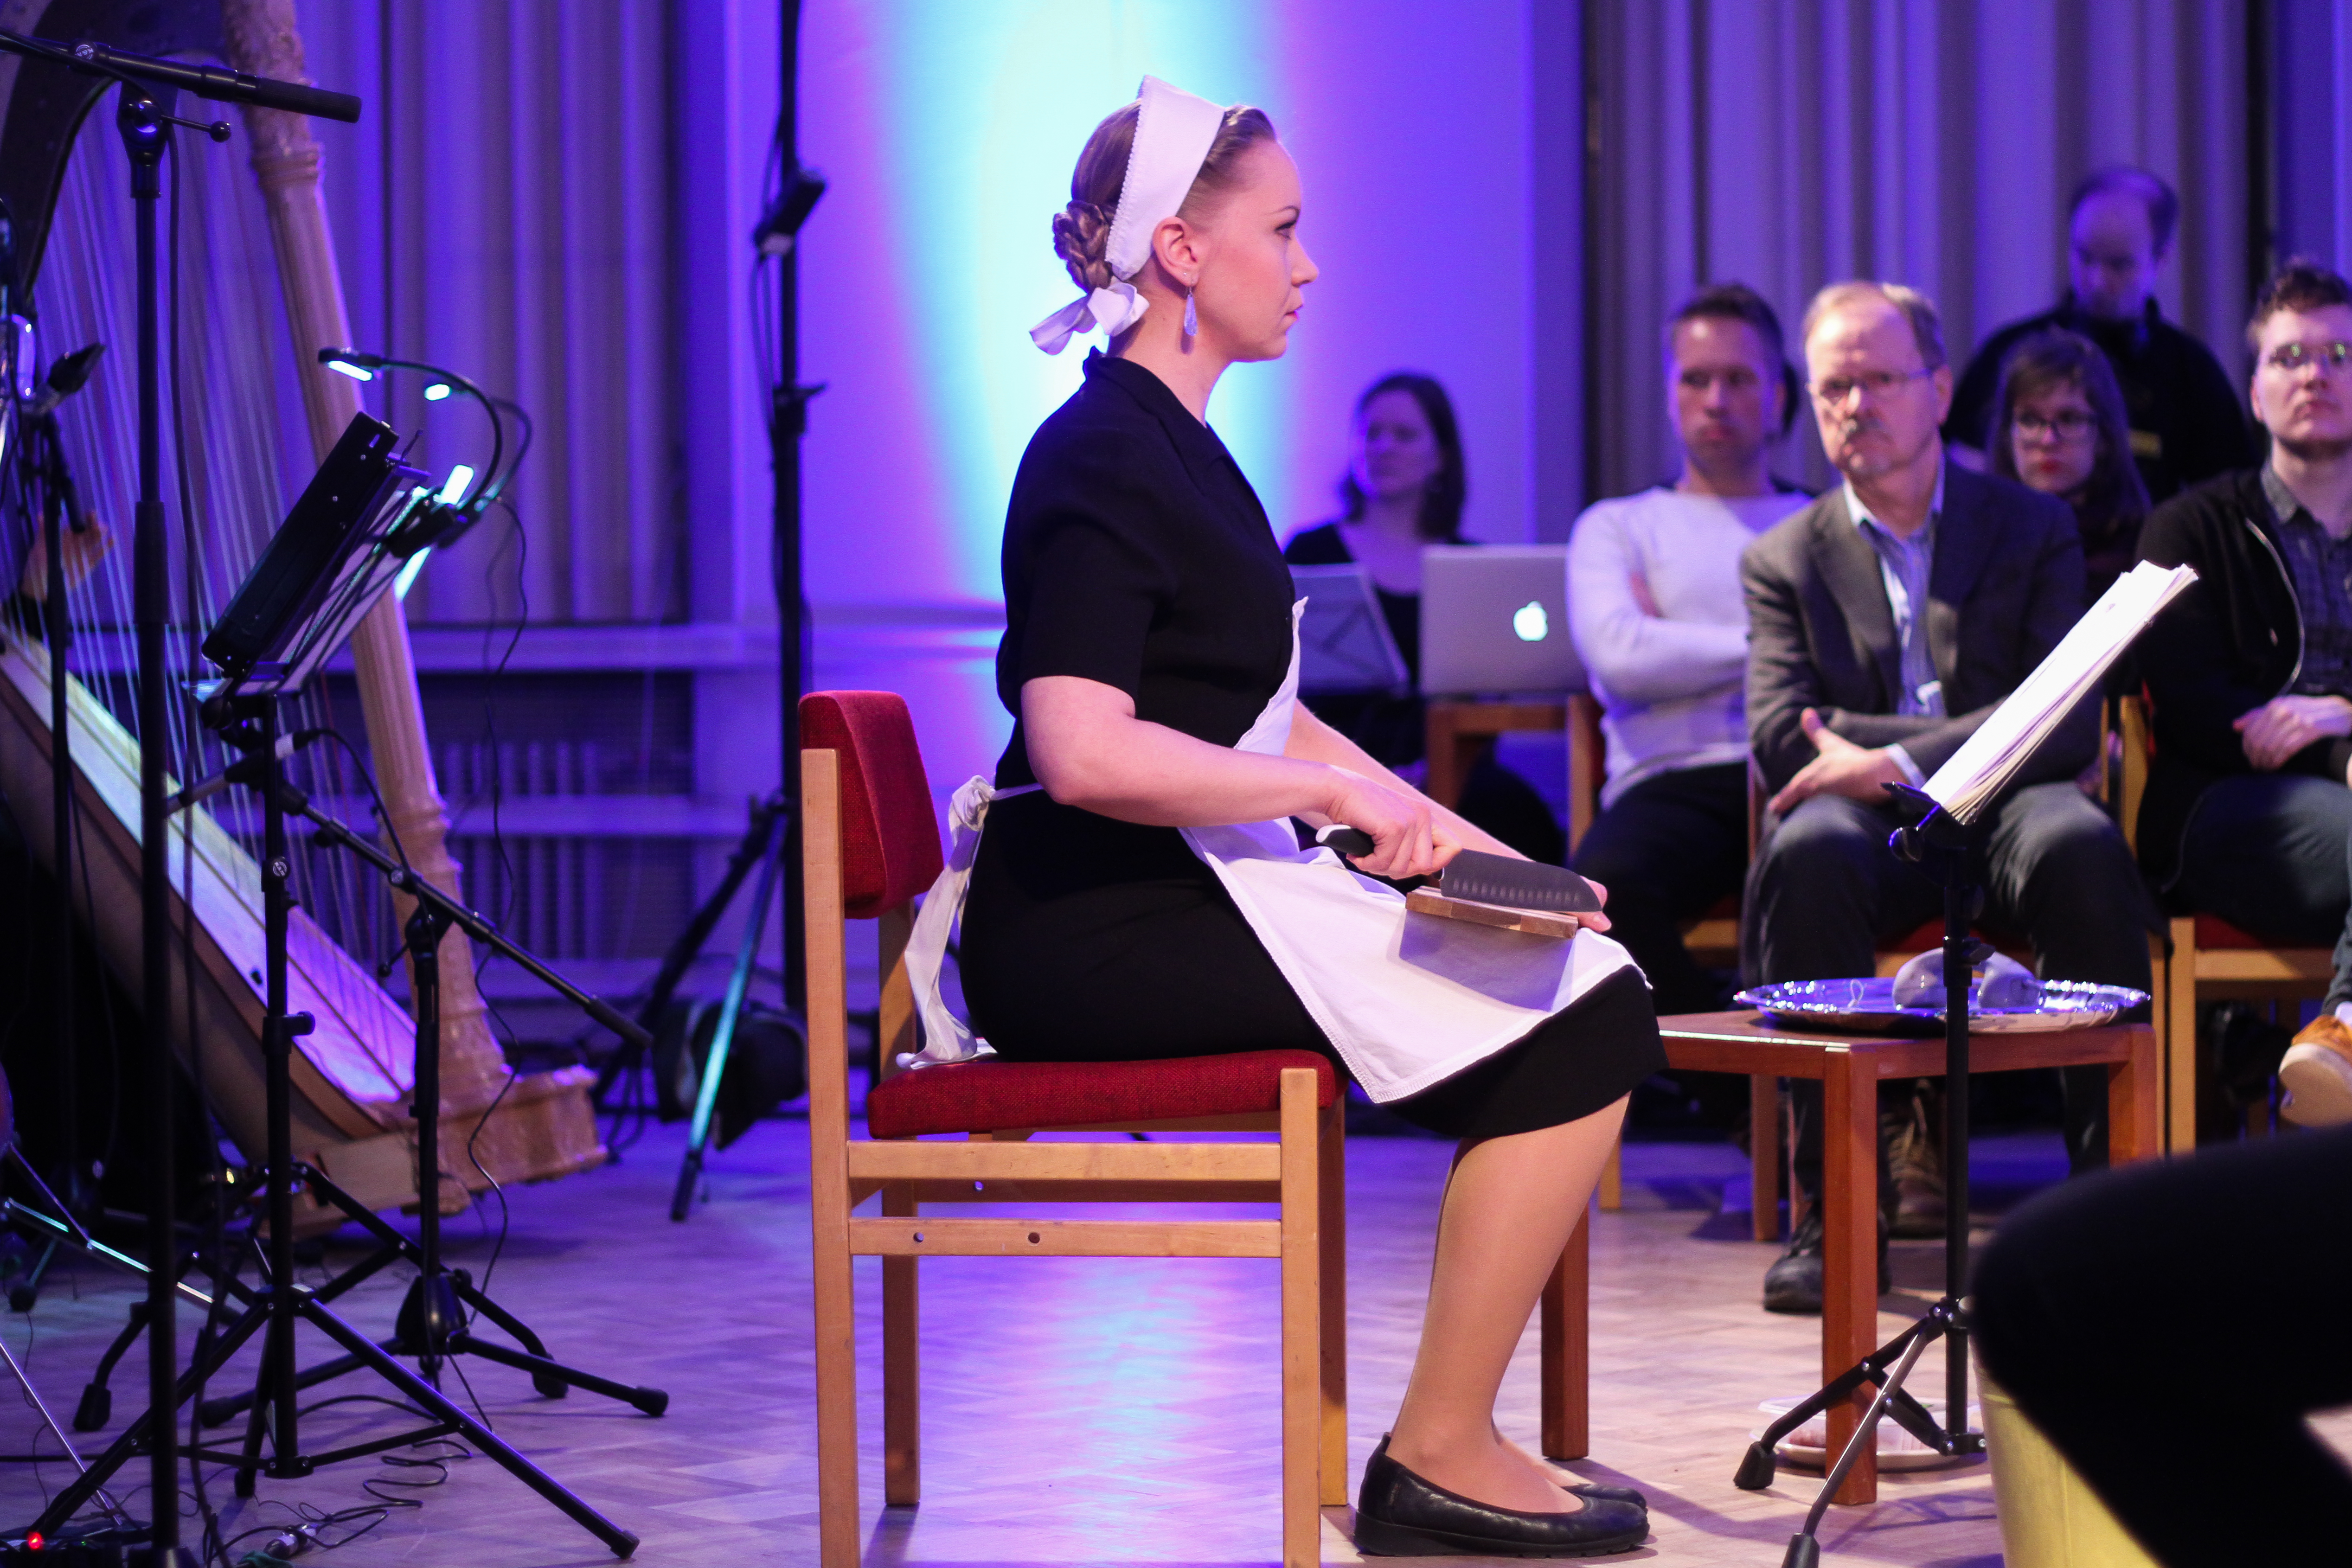 Riikka Talvitie: A Finnish composer